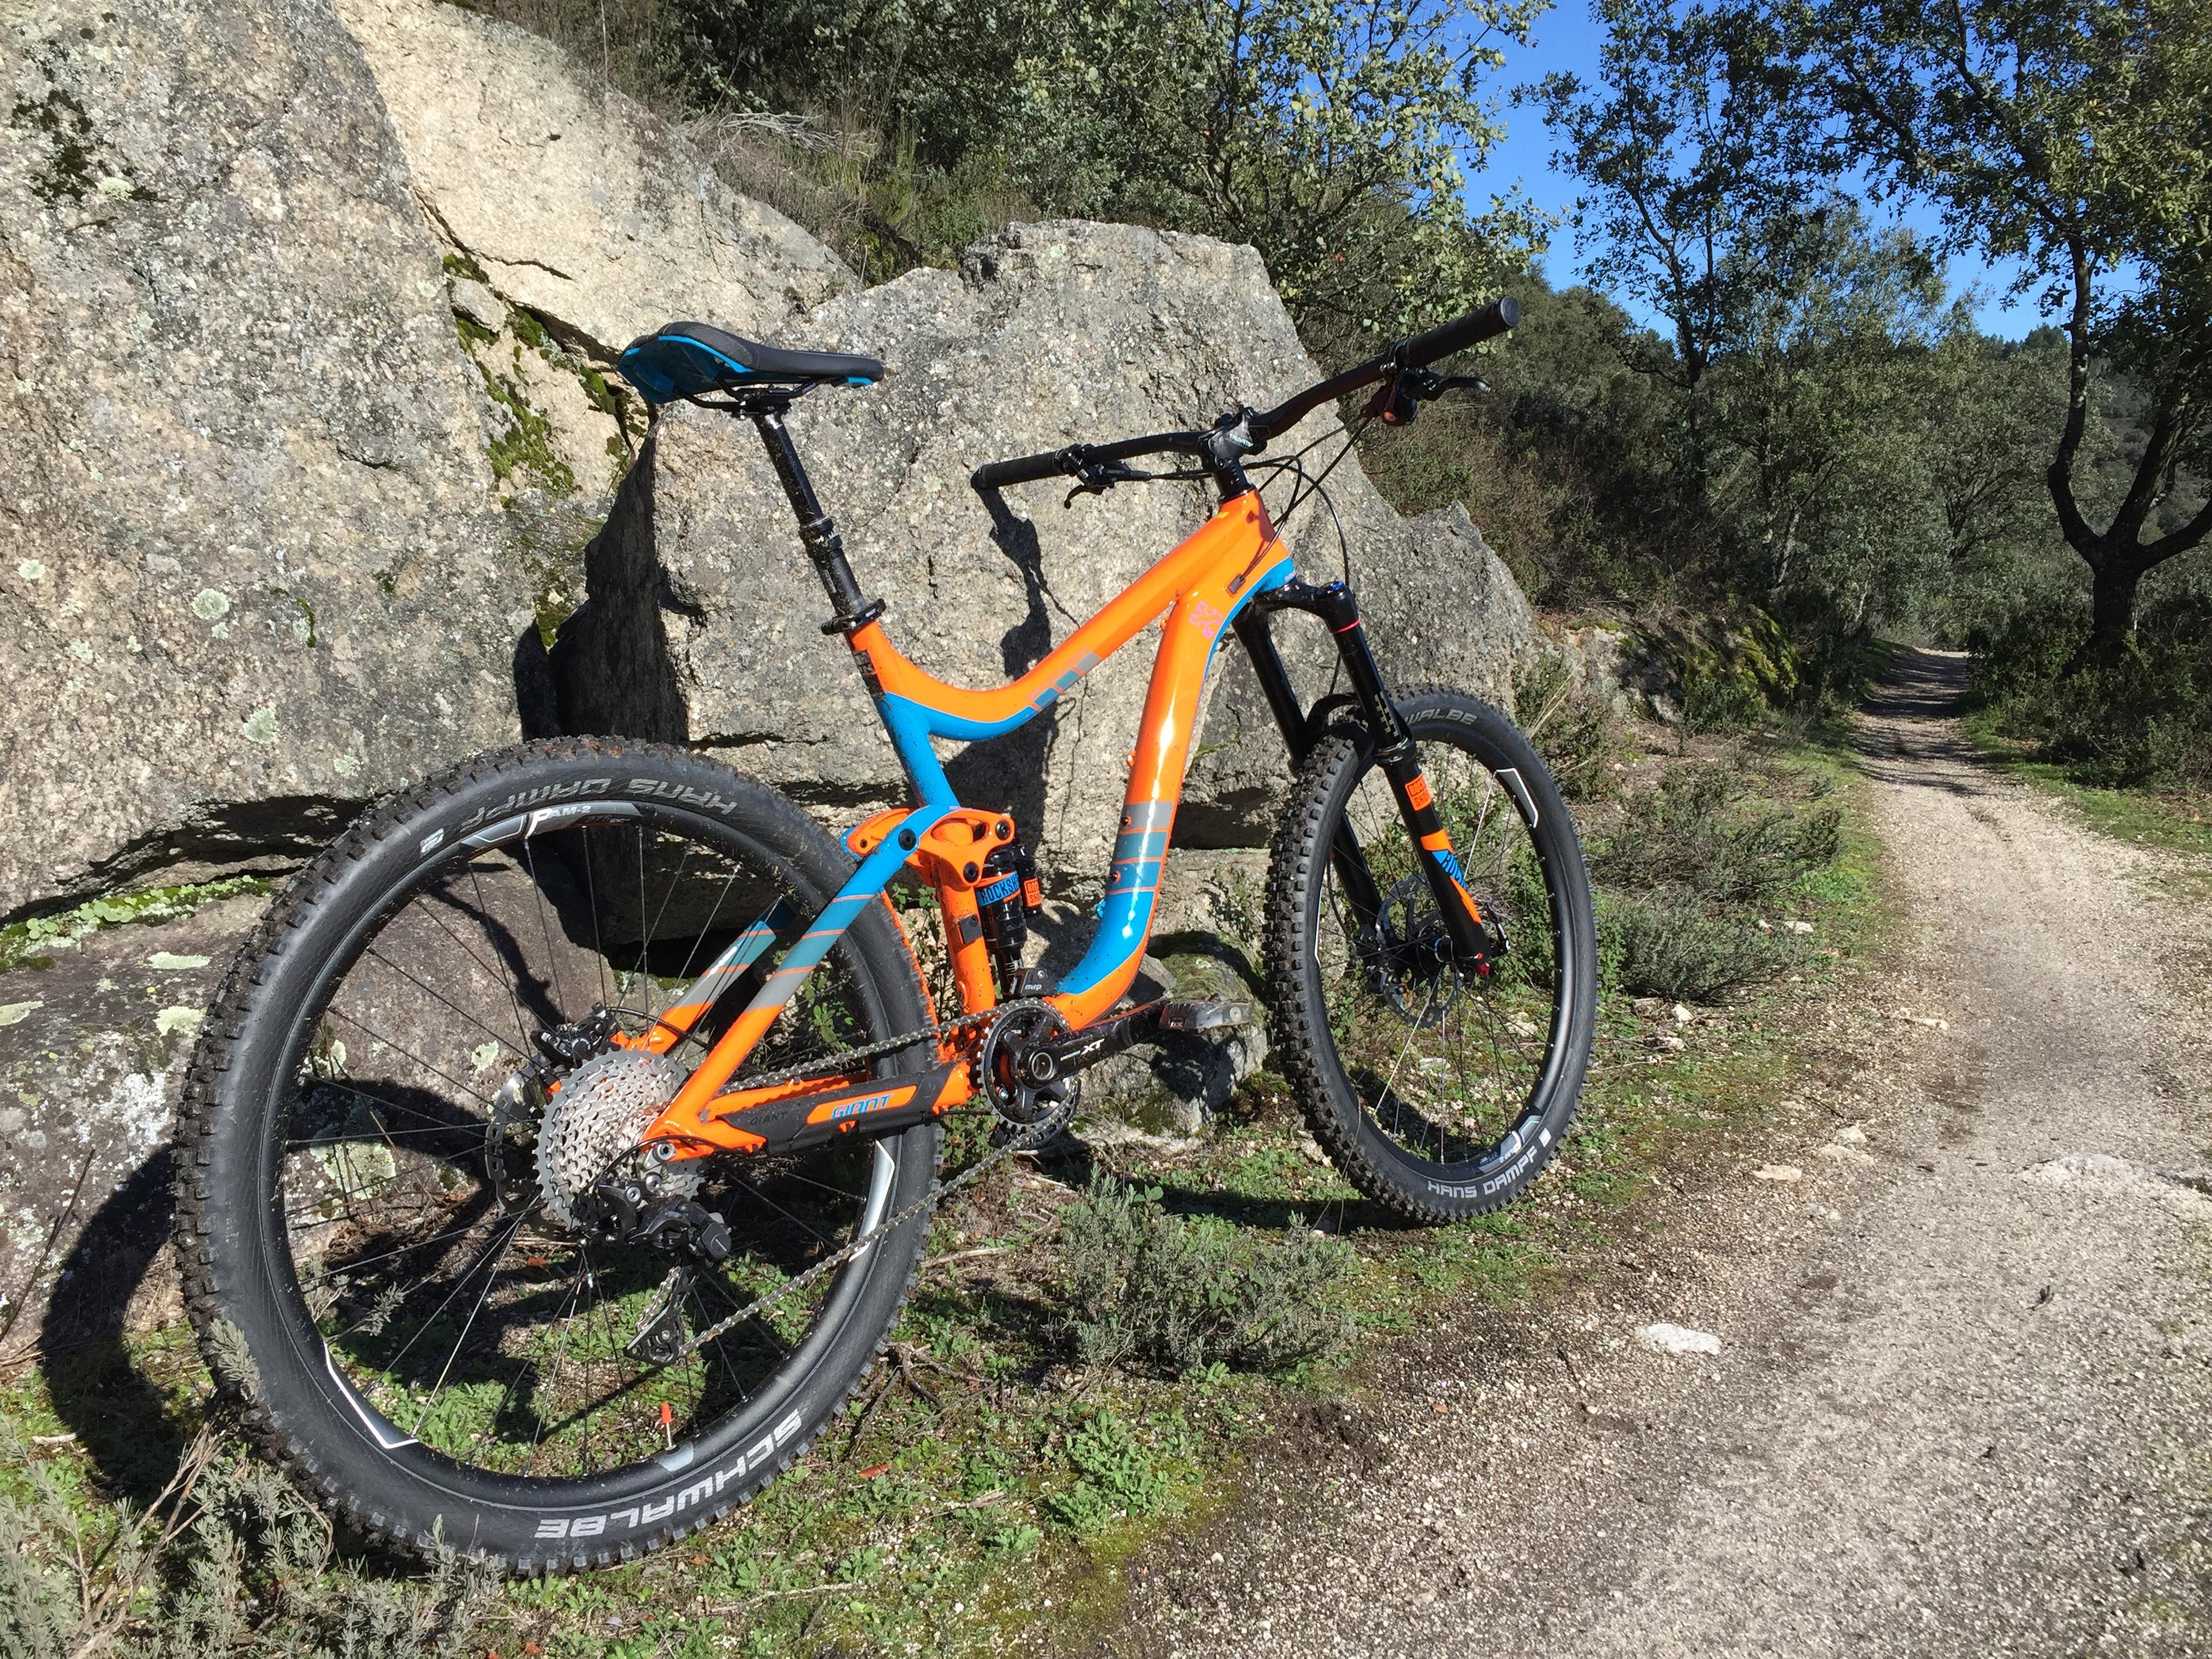 b44e851be3e Testing the Giant Reign 27.5 1.5 LTD 2016 - El Bierzo en bici